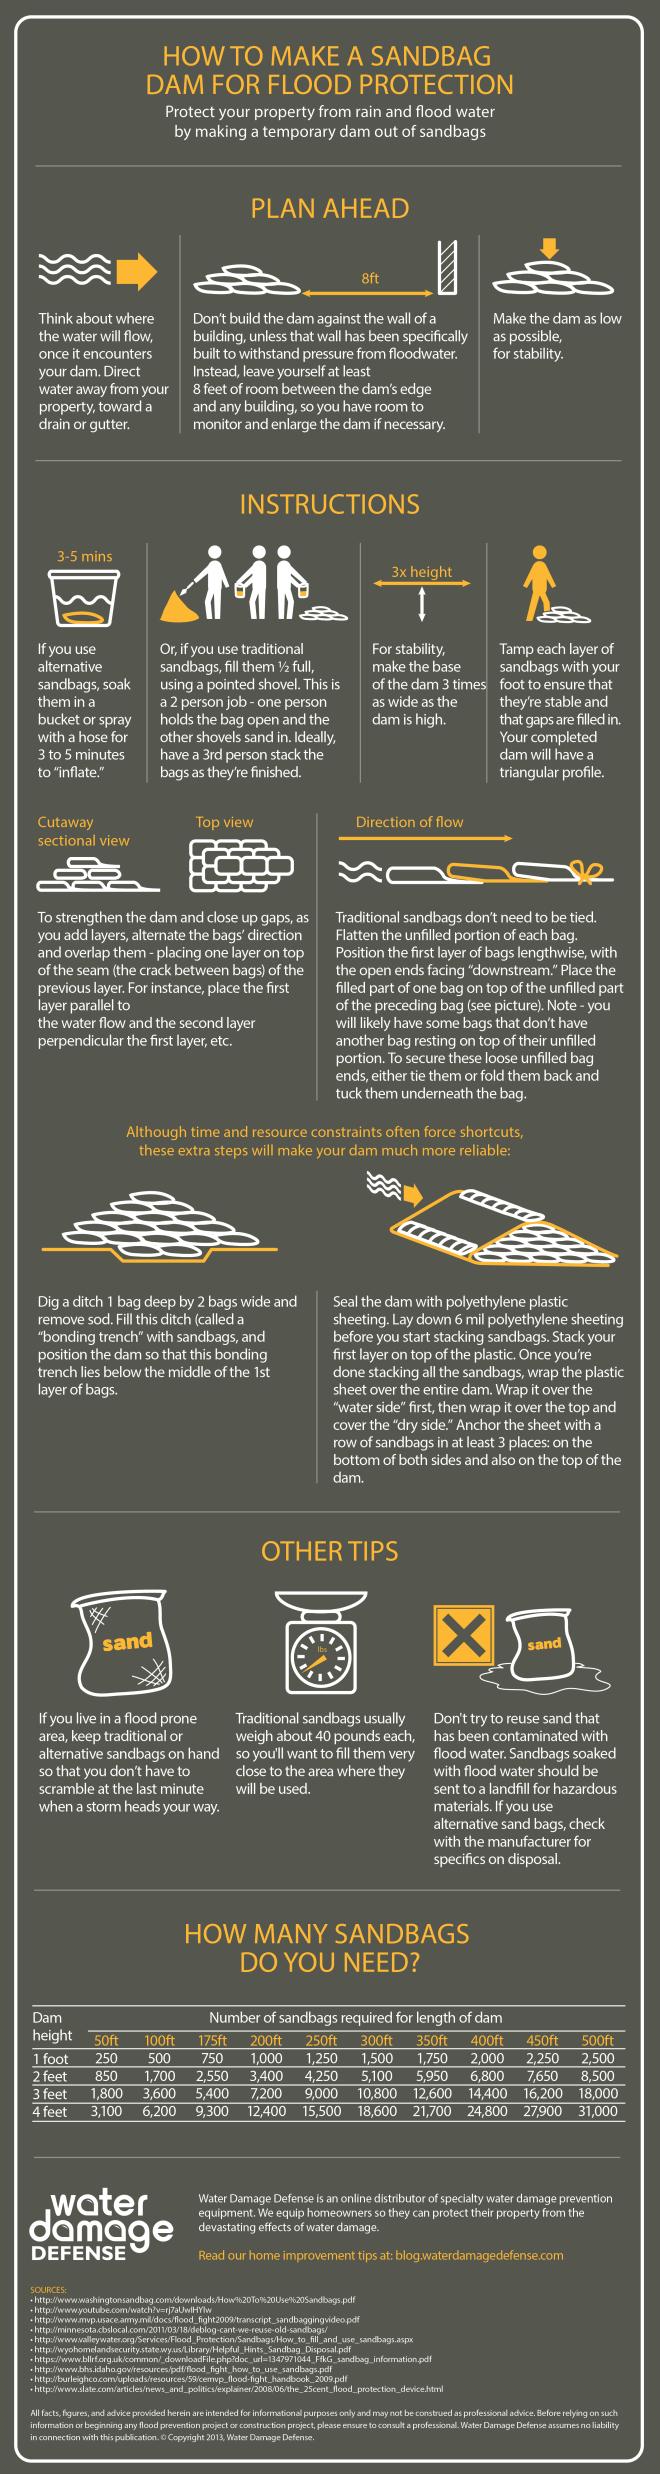 Infographic: How to Make a Sandbag Dam For Flood Protection #infographic